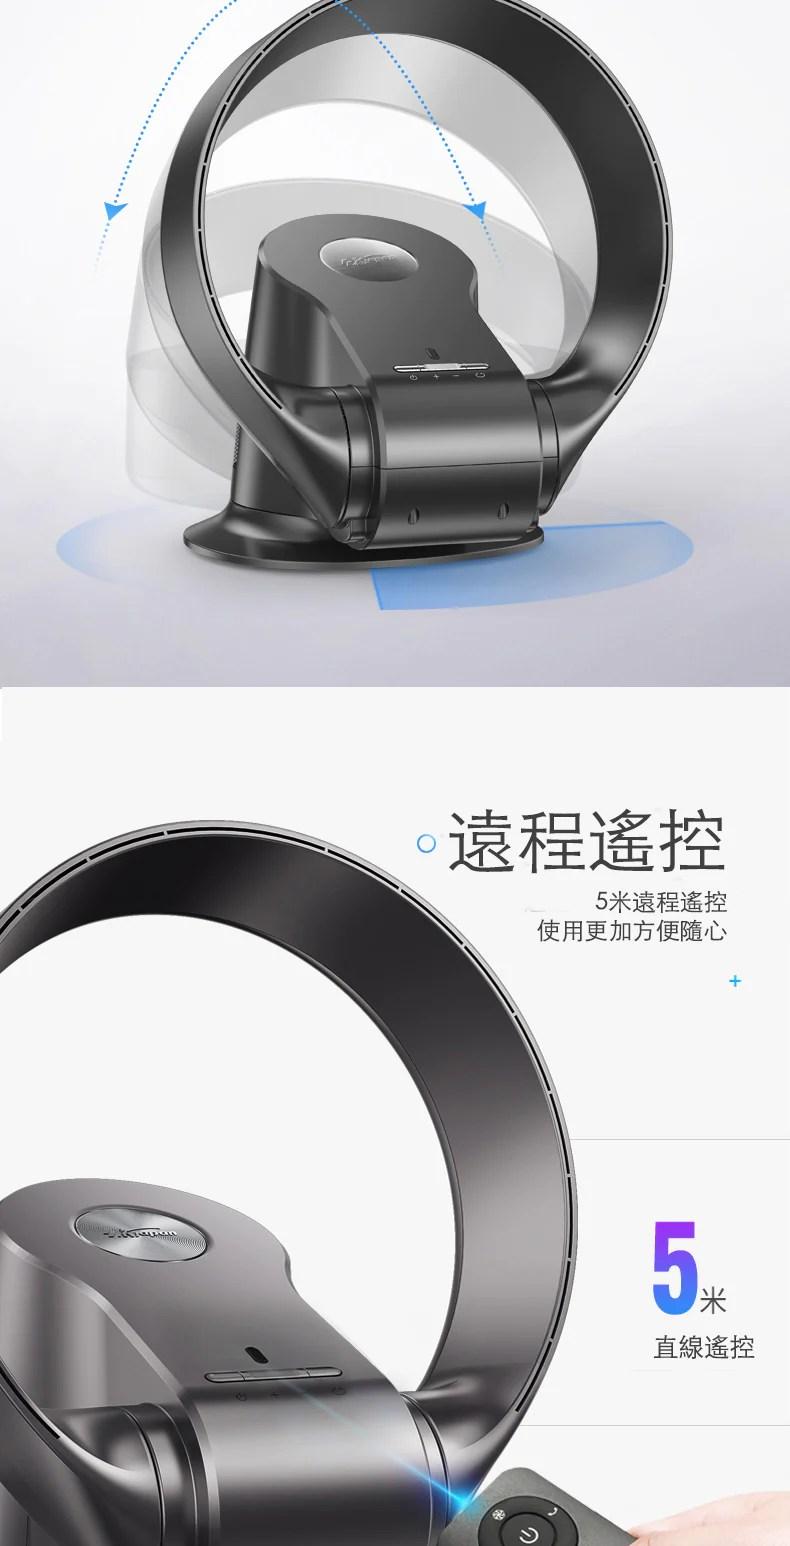 SK Japan 2020新款 12吋可摺疊無葉風扇 CR-309WD(香港三腳插)